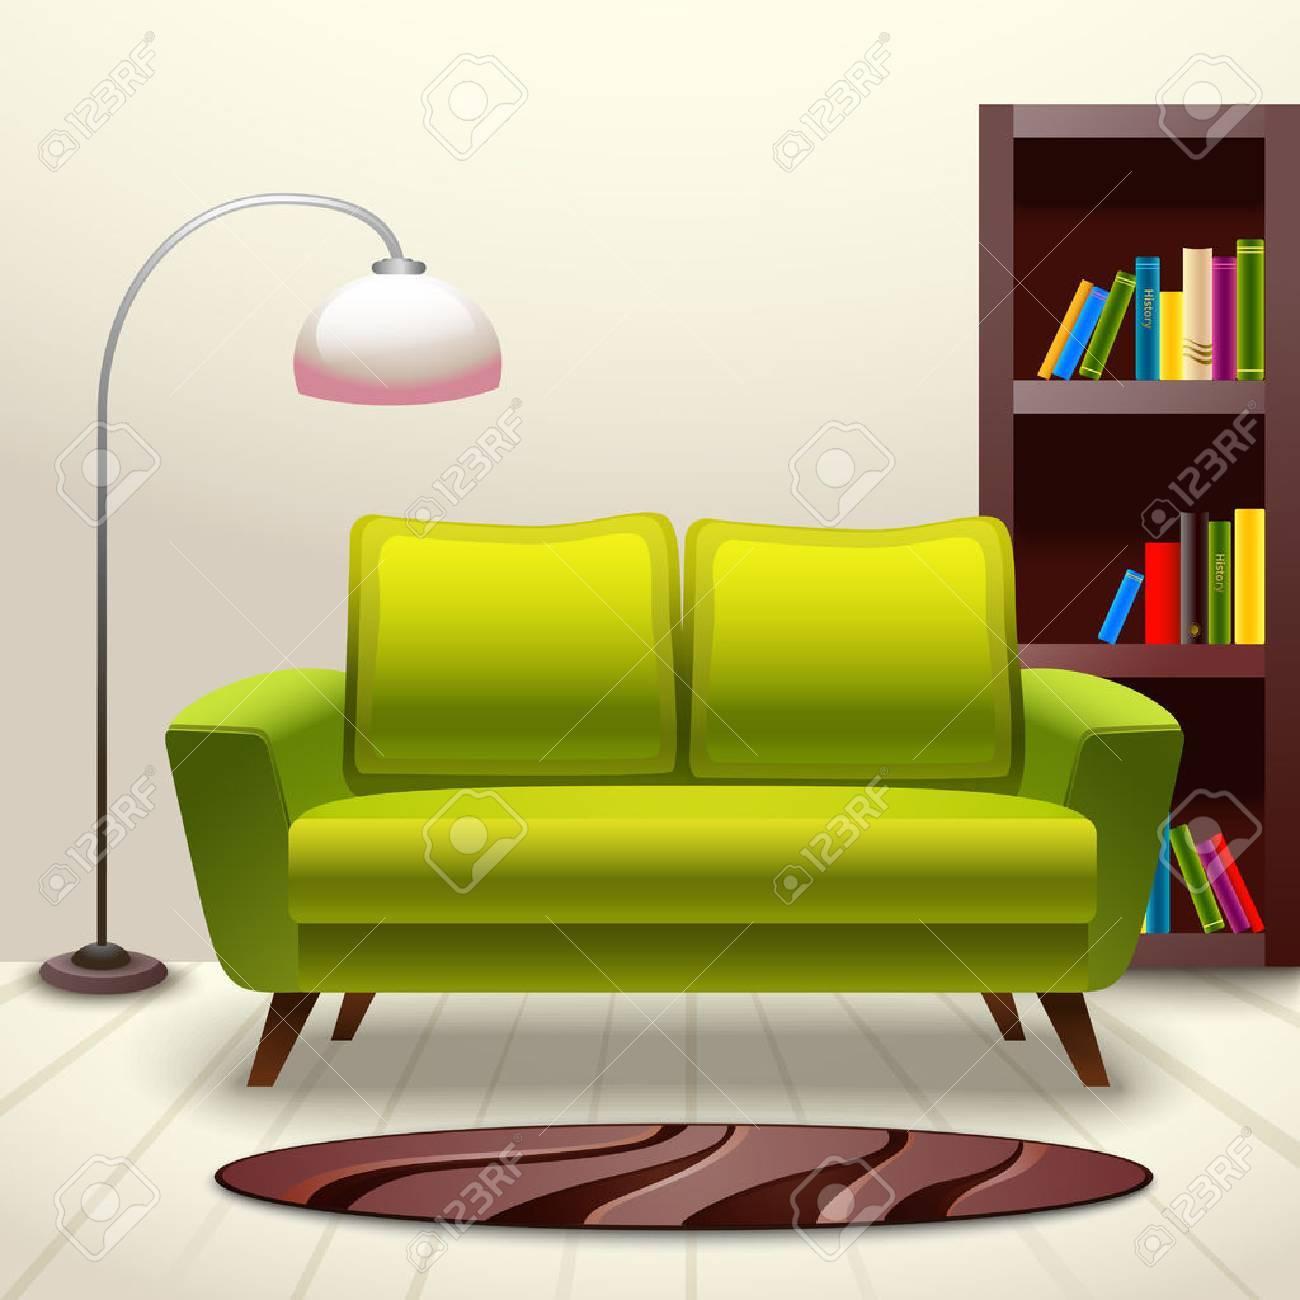 Interior Indoor Living Room Design With Sofa Lamp And Bookshelf Vector Illustration Stock